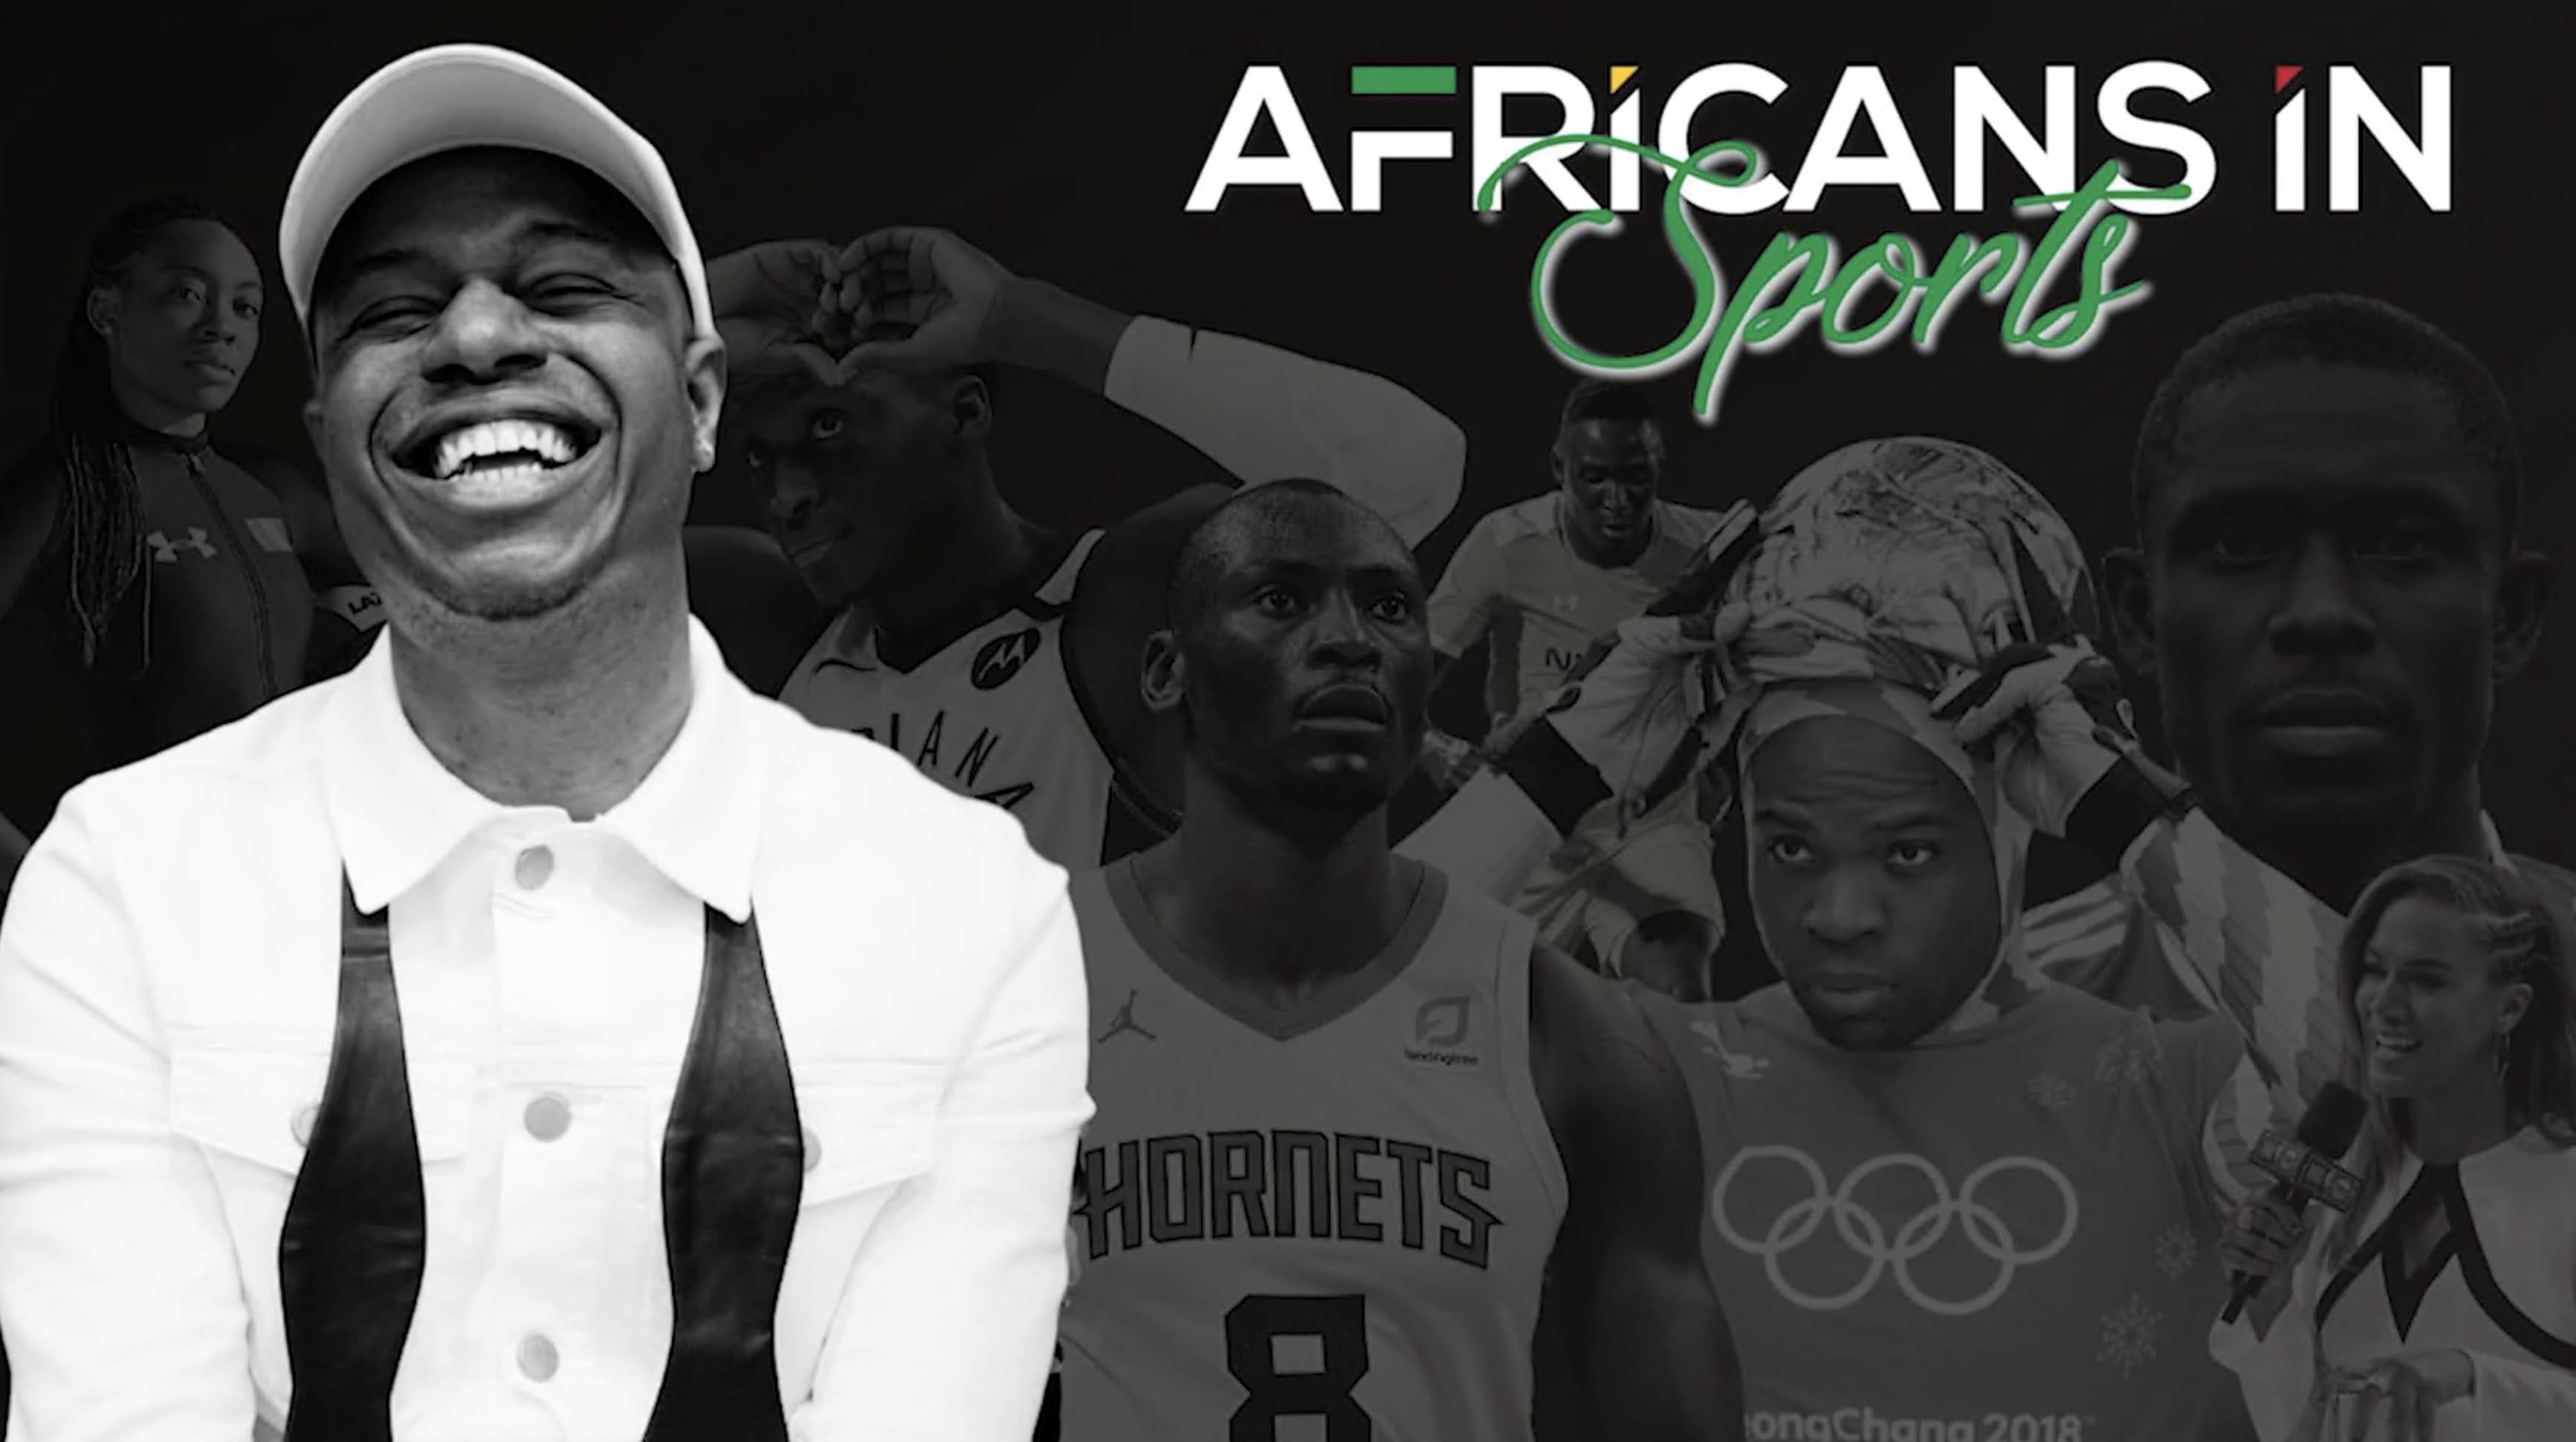 Africans in Sport